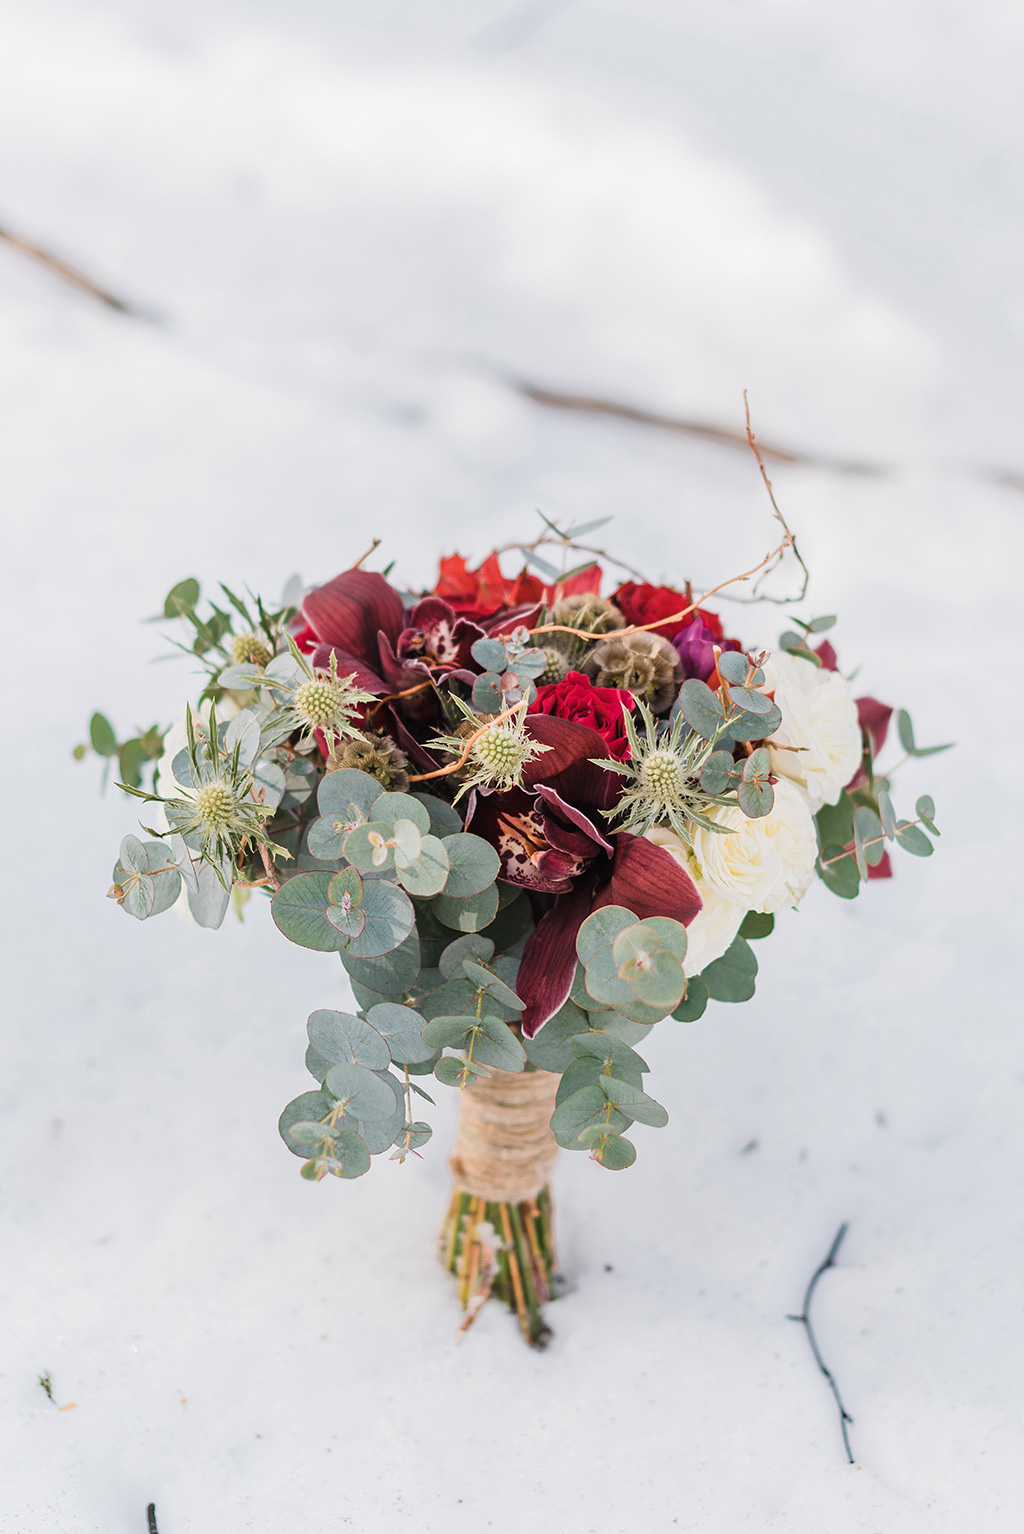 prewedding φωτογράφιση στα χιόνια, μια υπέροχη εμπειρία για το ζευγάρι, engagement bouquet